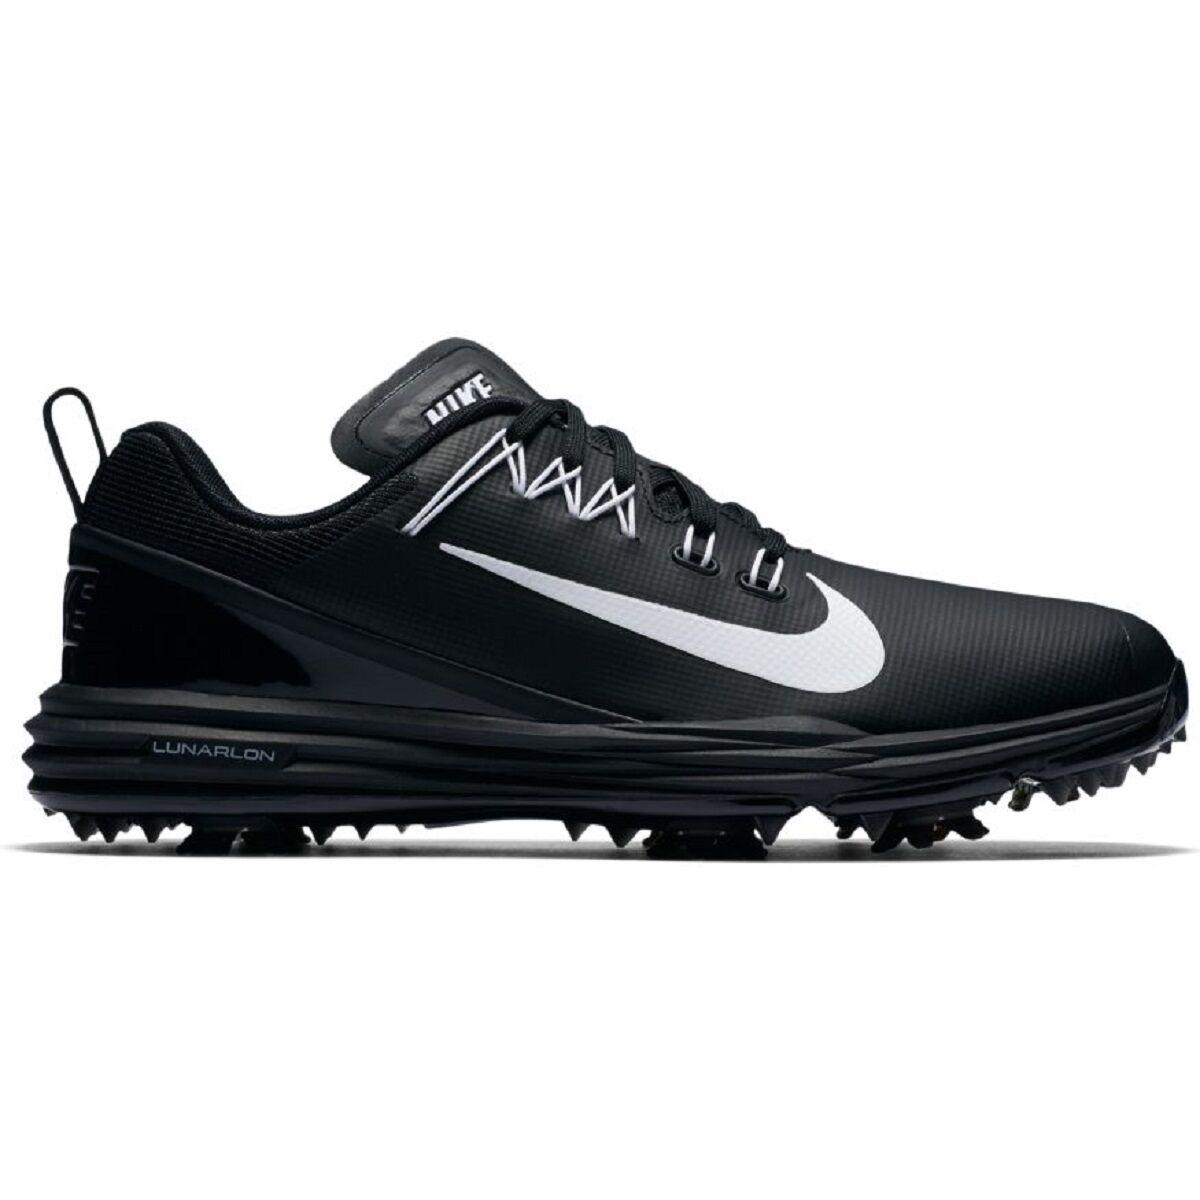 Nike LUNAR COMMAND 2 DONNA